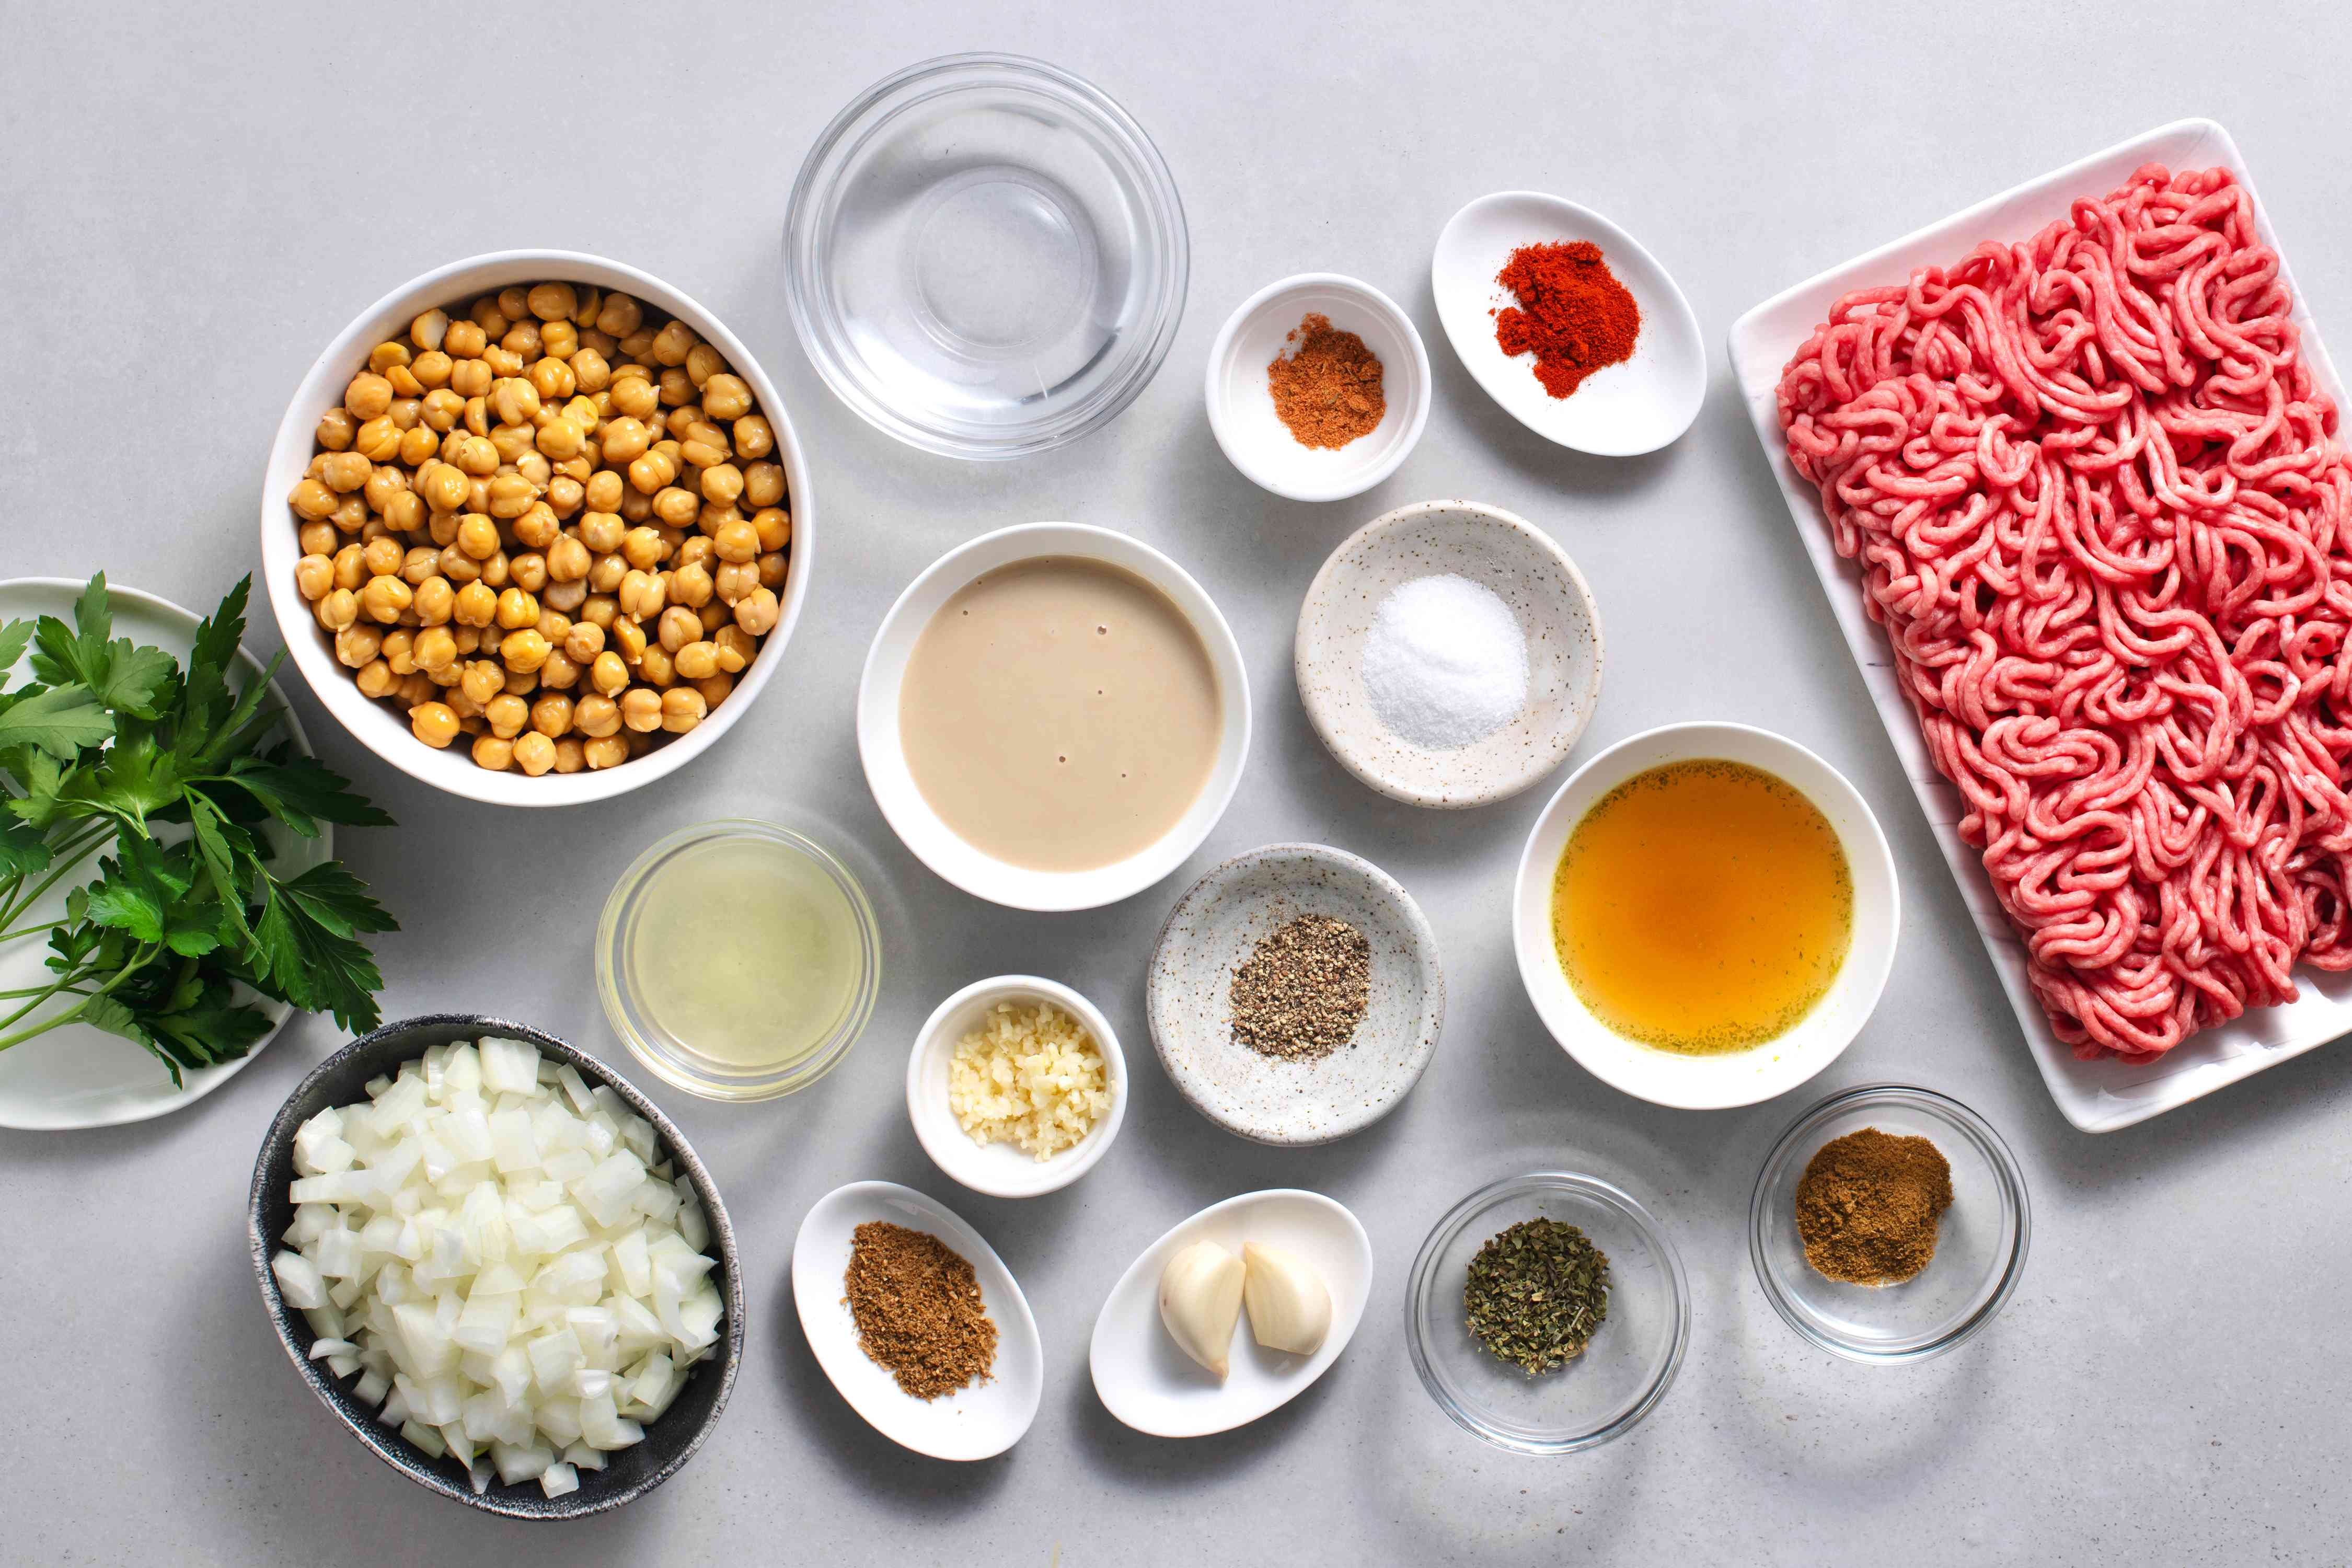 Spiced Beef on Hummus ingredients